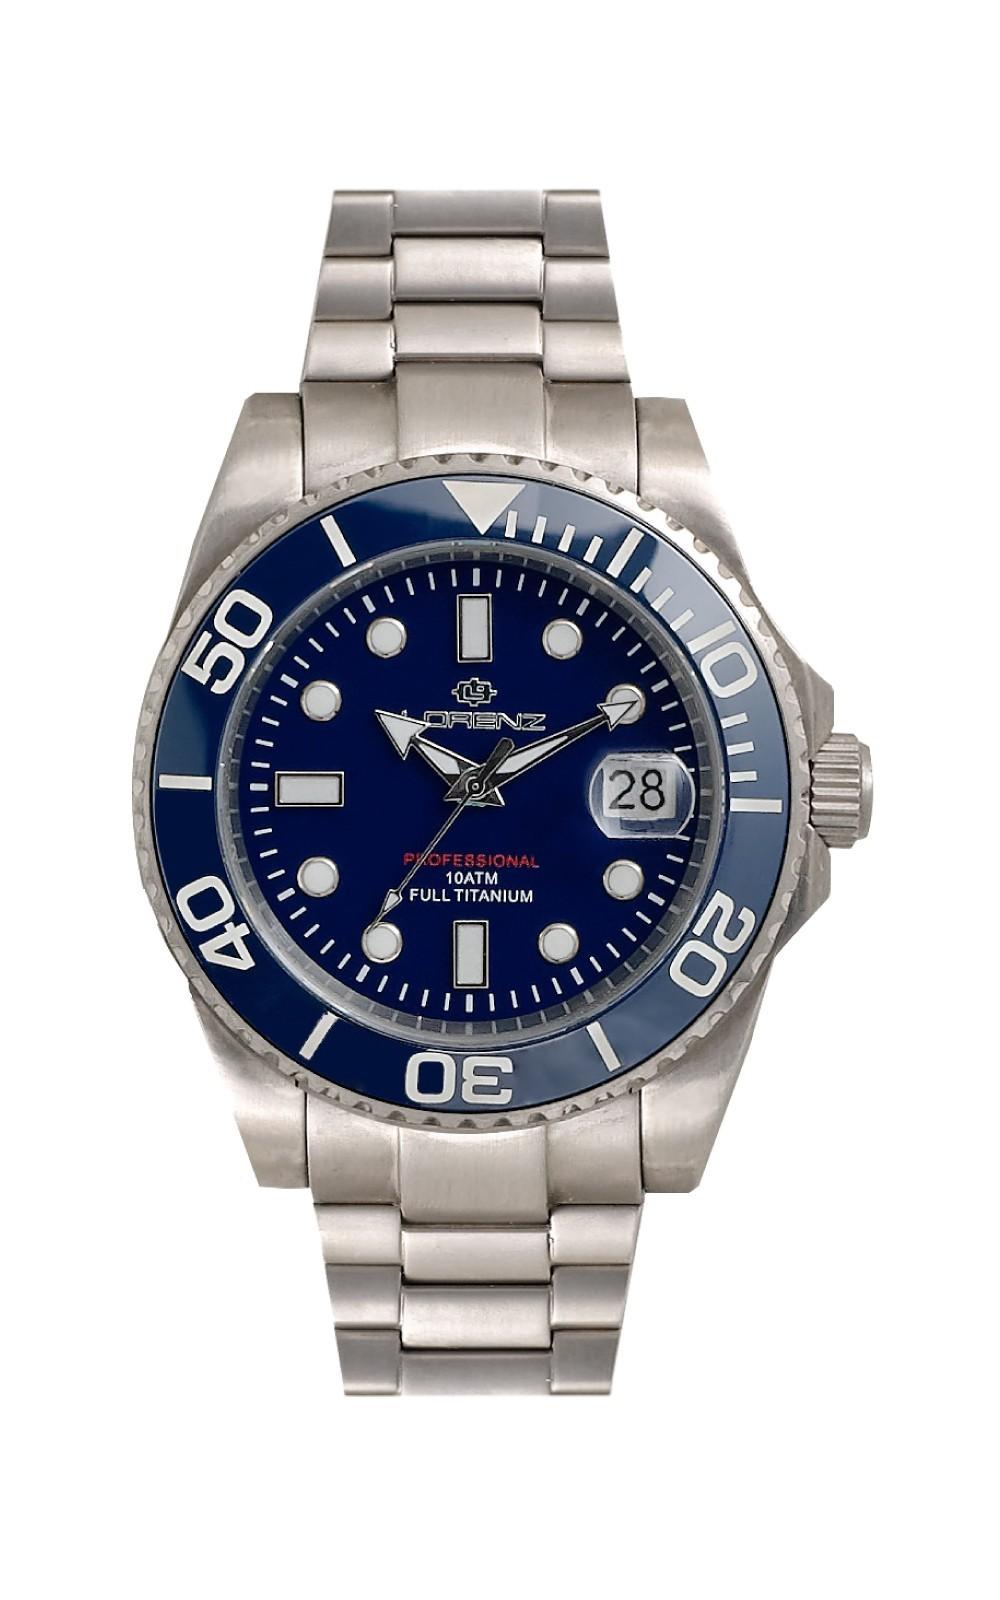 Watch Lorenz Full Titanium 030196BB